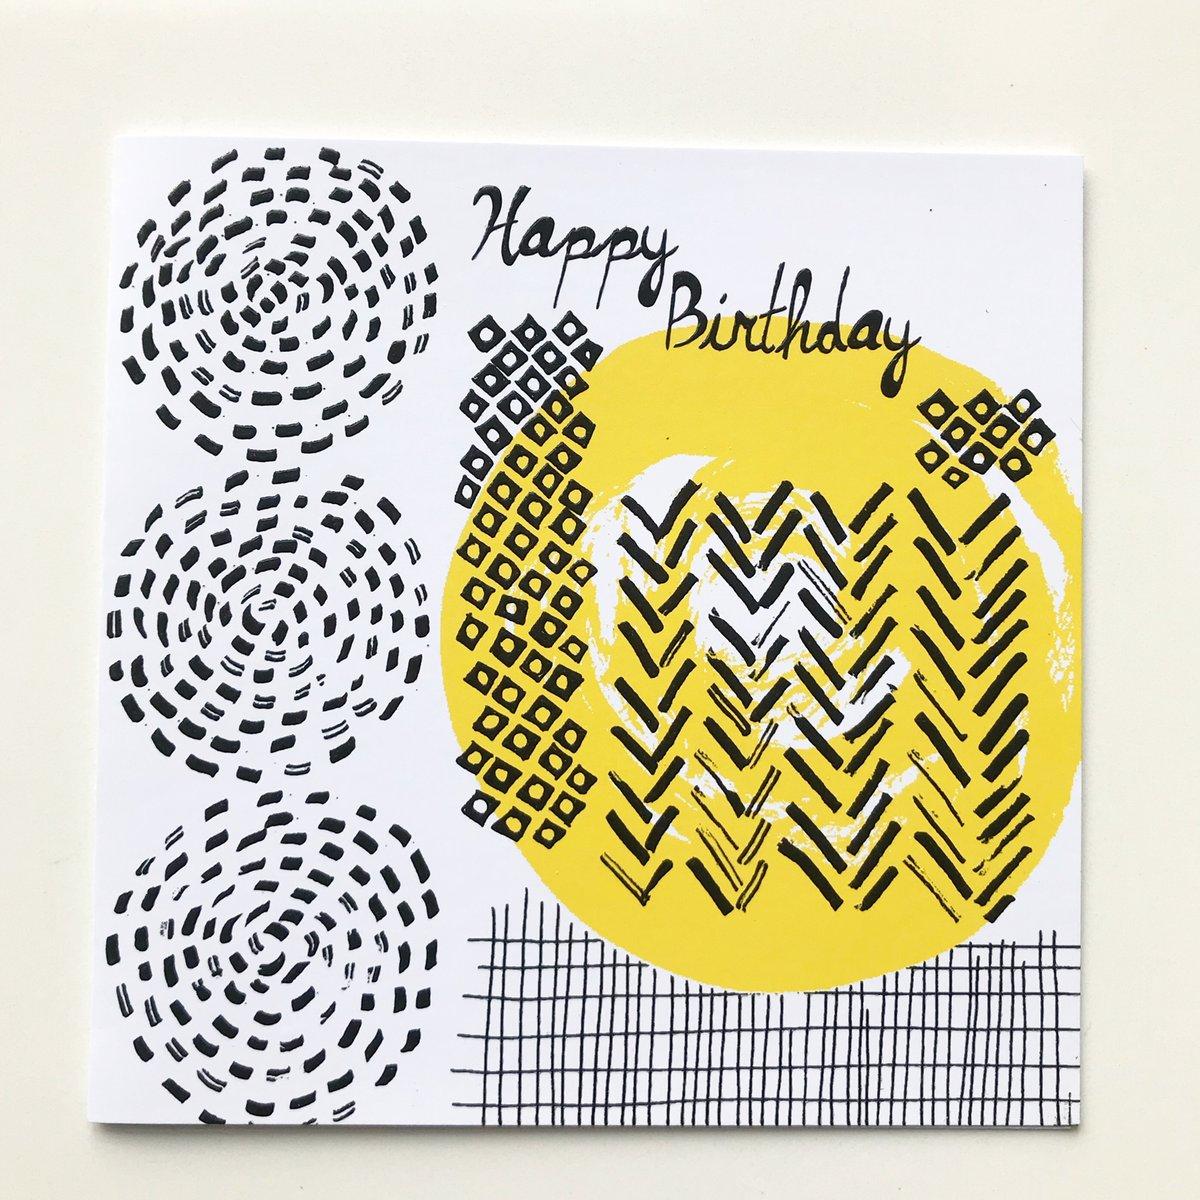 Image of Happy Birthday retro modern card